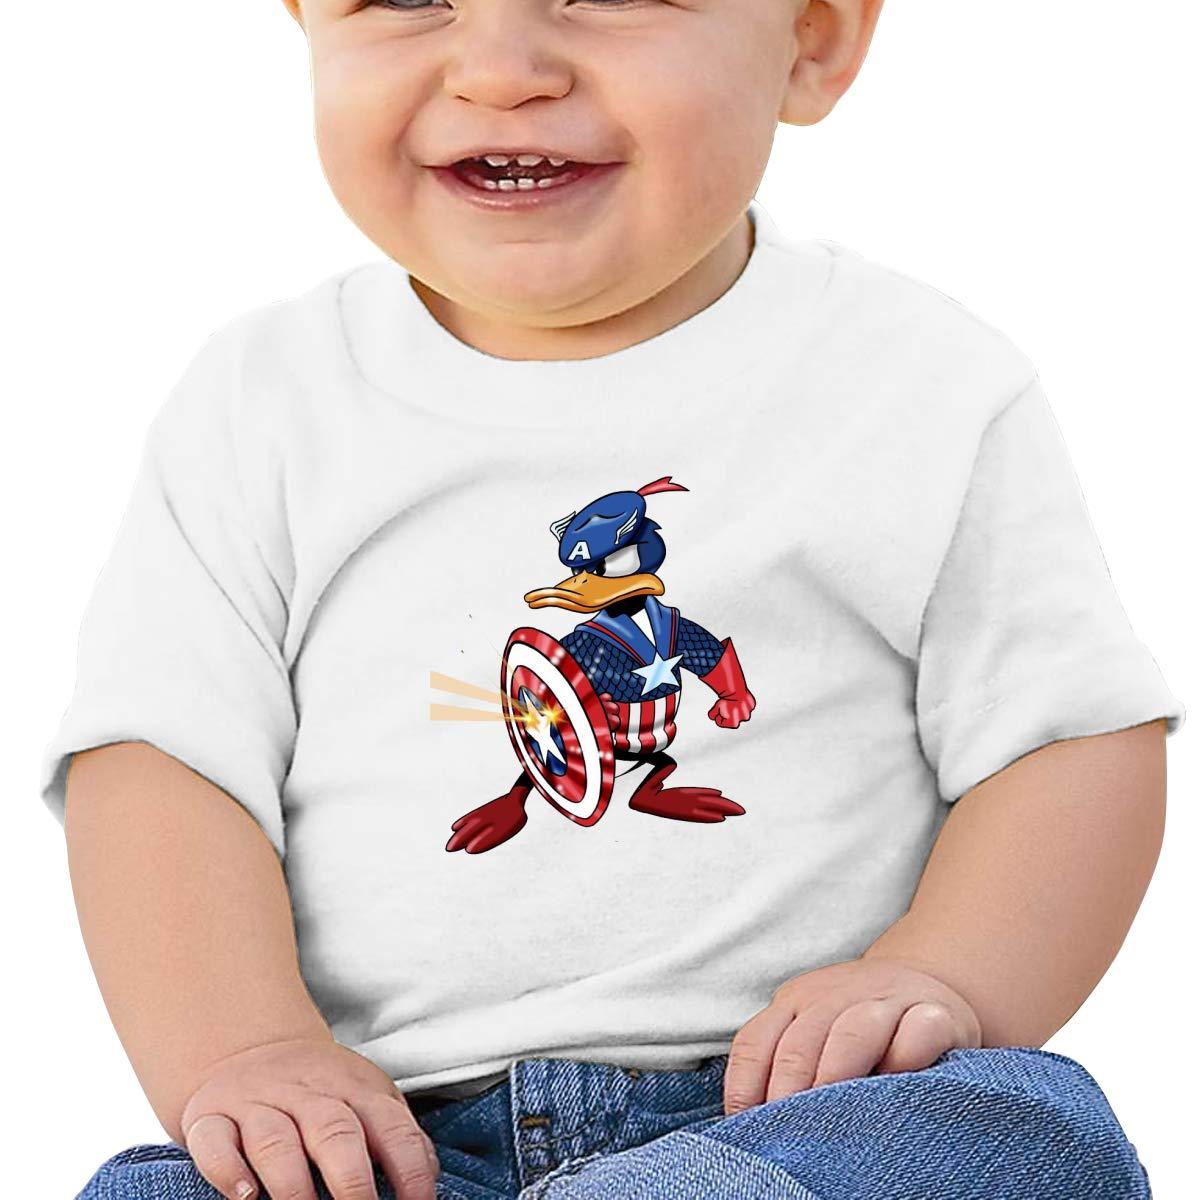 BuecoutesCaptain Donald Duck Toddler//Infant Short Sleeve Cotton T Shirts White